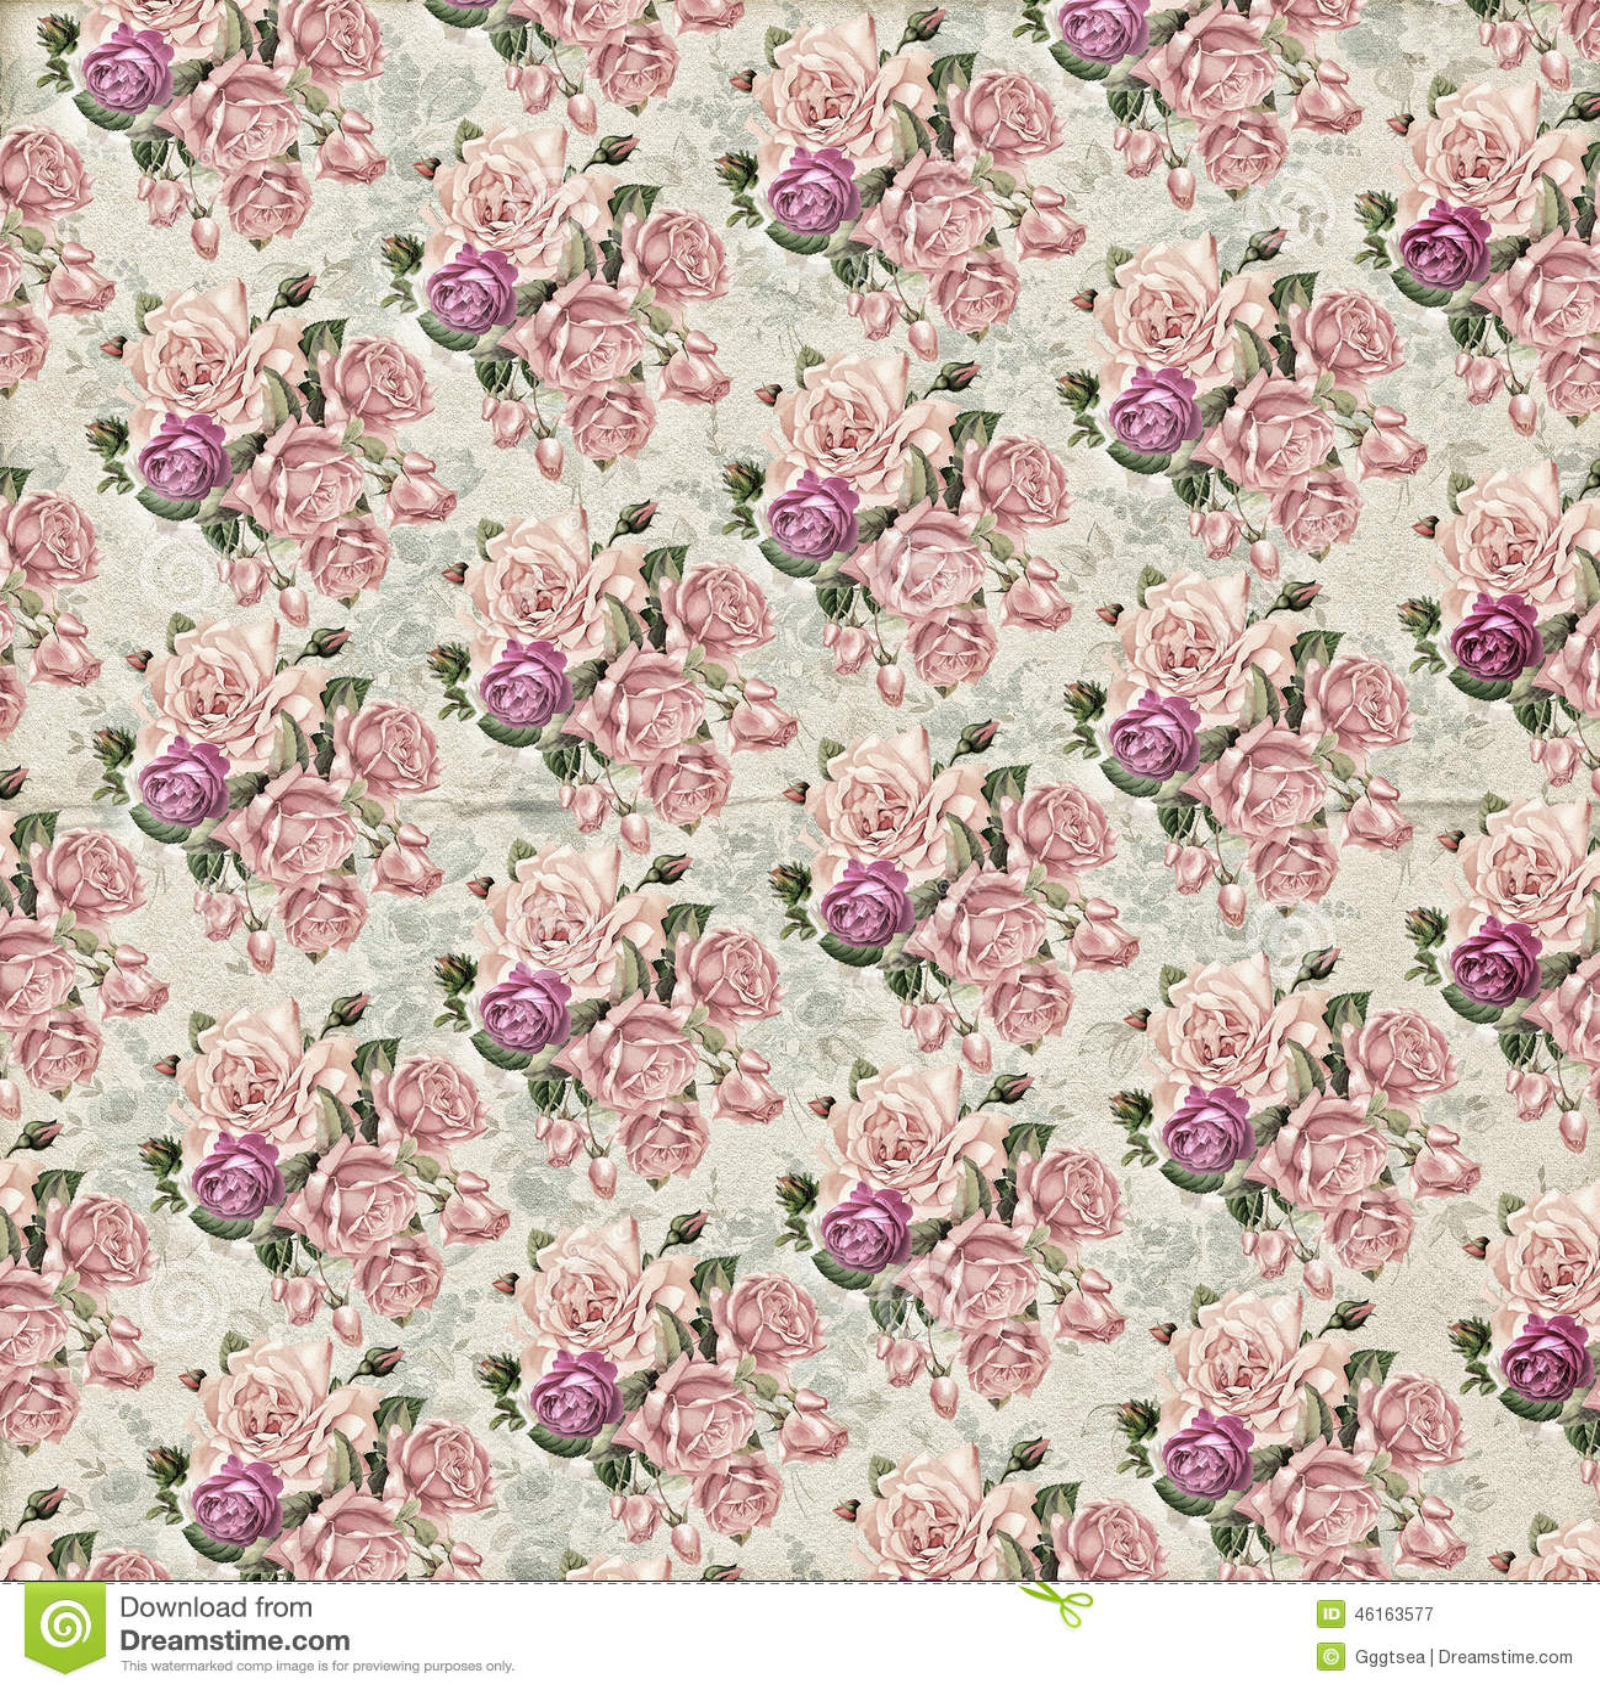 Vintage Flower Wallpaper Texture